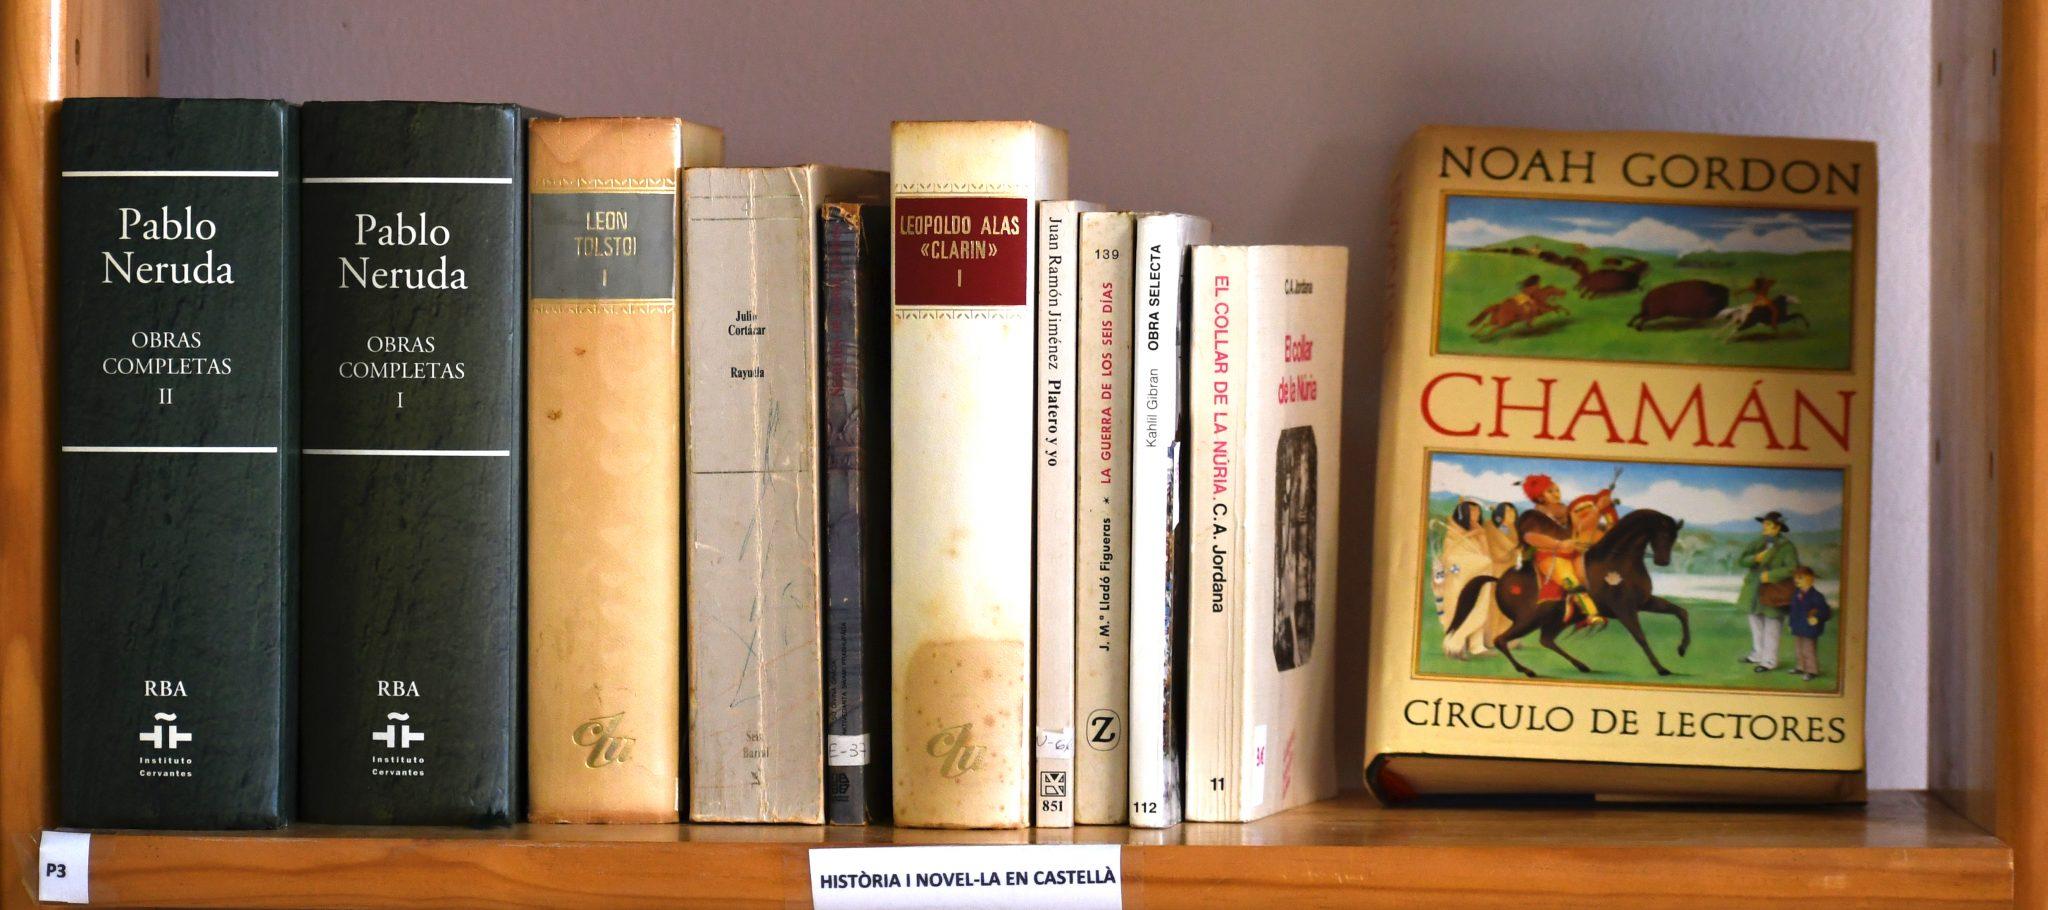 Novel·la en castellà